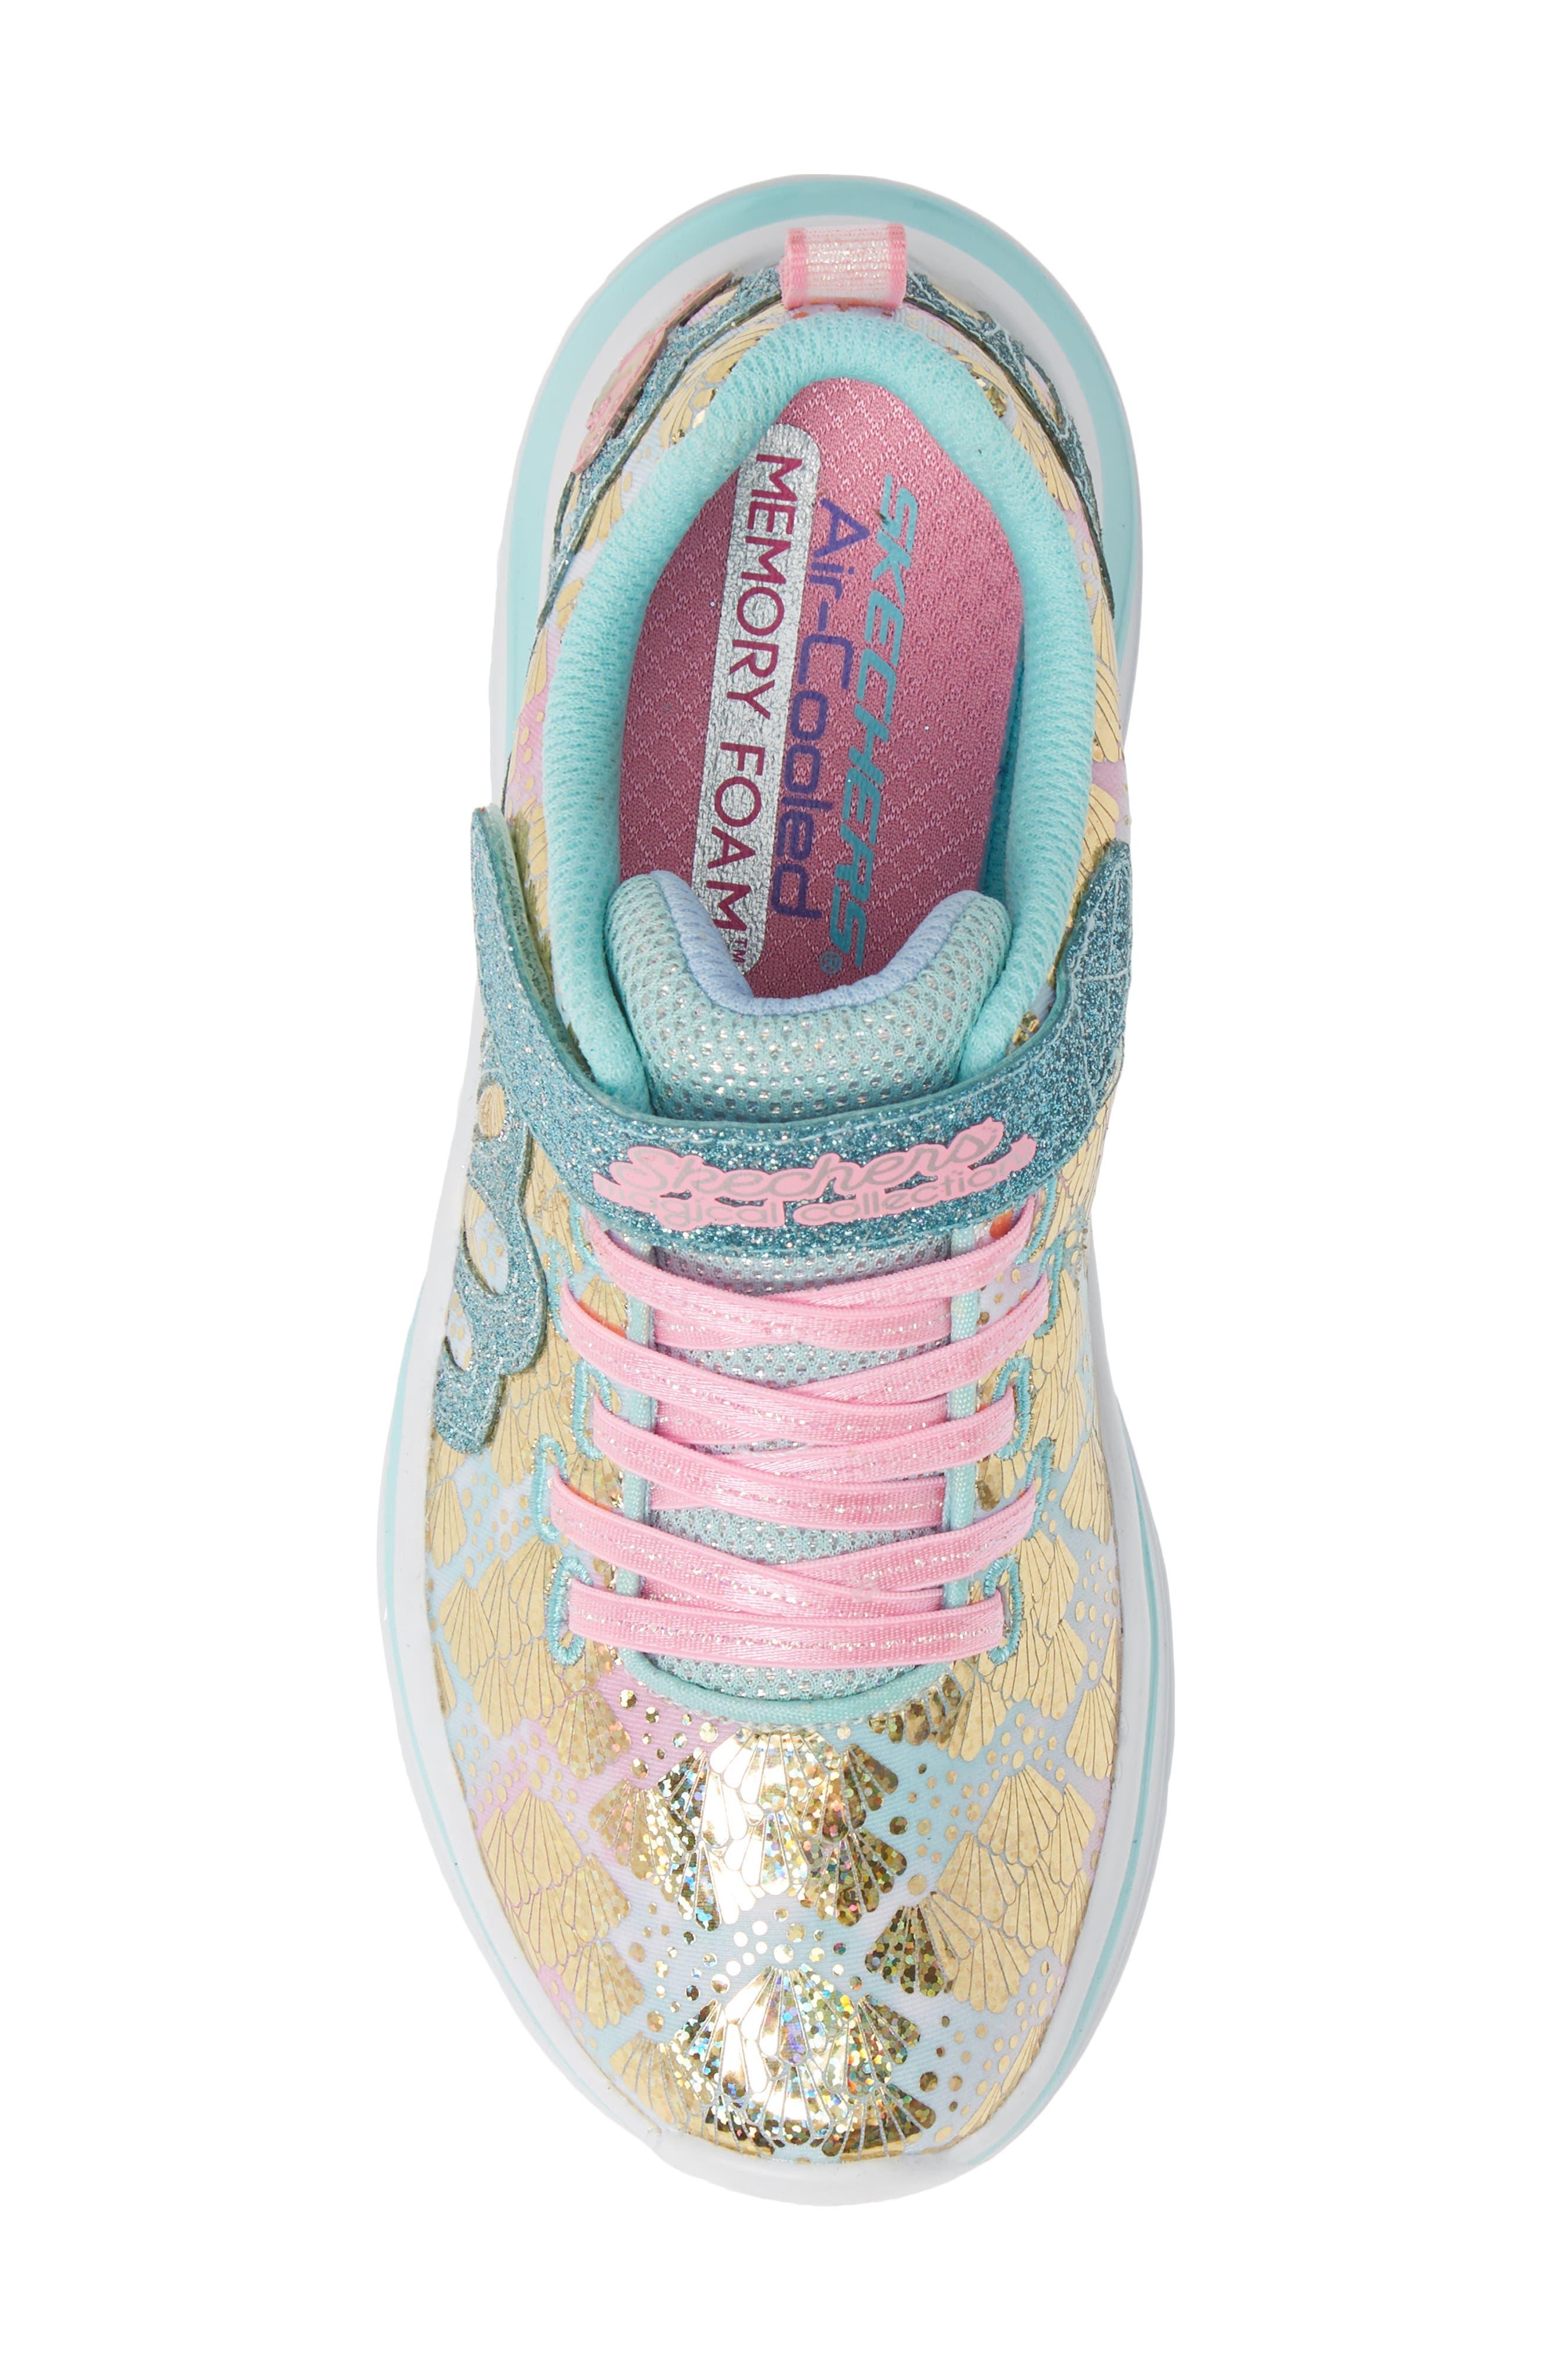 SKECHERS, Double Dreams Shimmer Sneaker, Alternate thumbnail 5, color, AQUA/ PINK TEXTILE